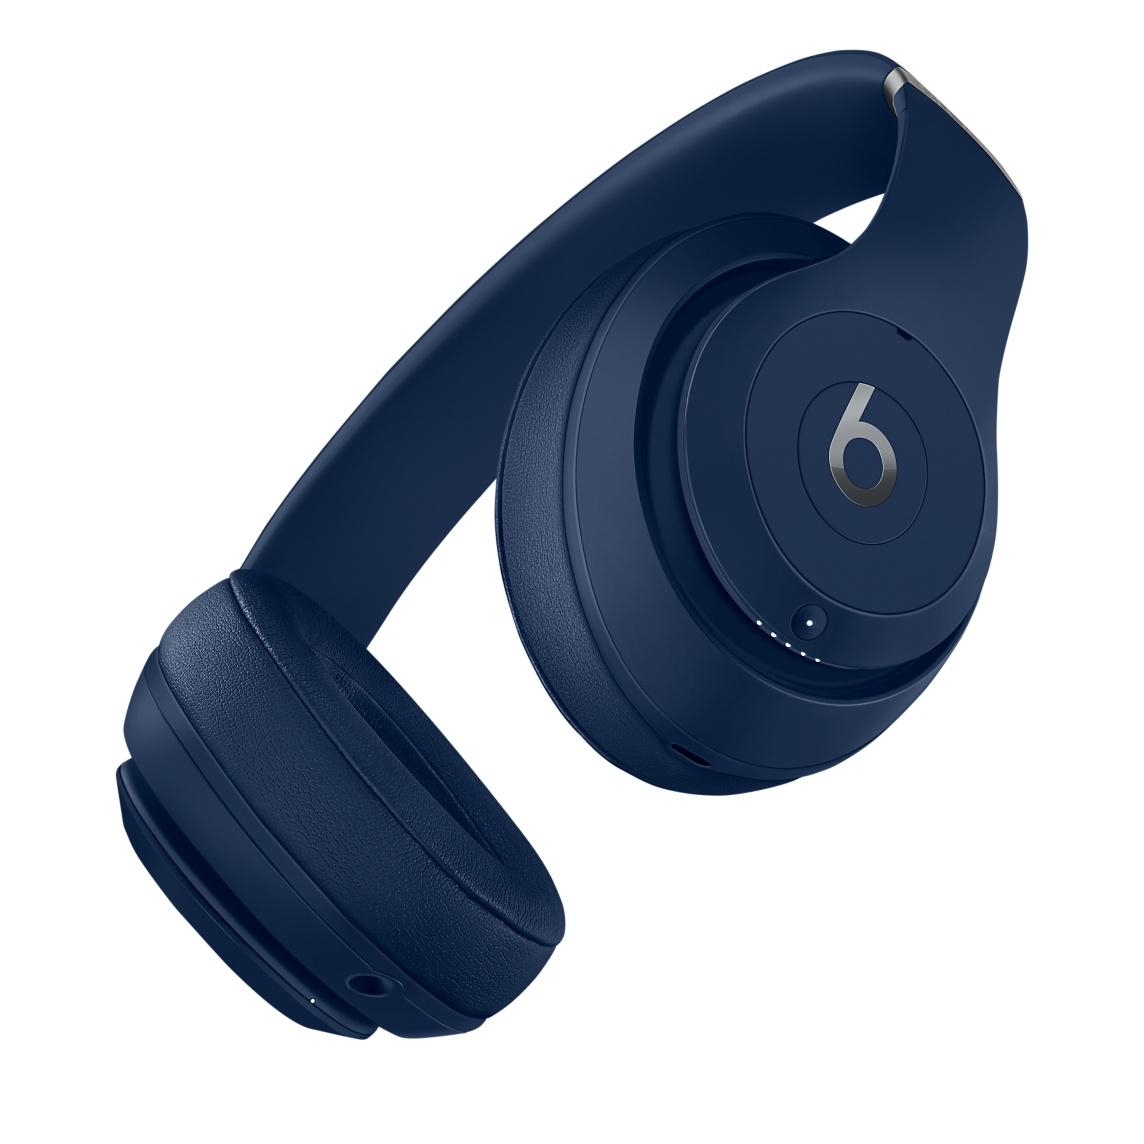 Beats Studio3 Wireless review: Eliminating the noise - SlashGear